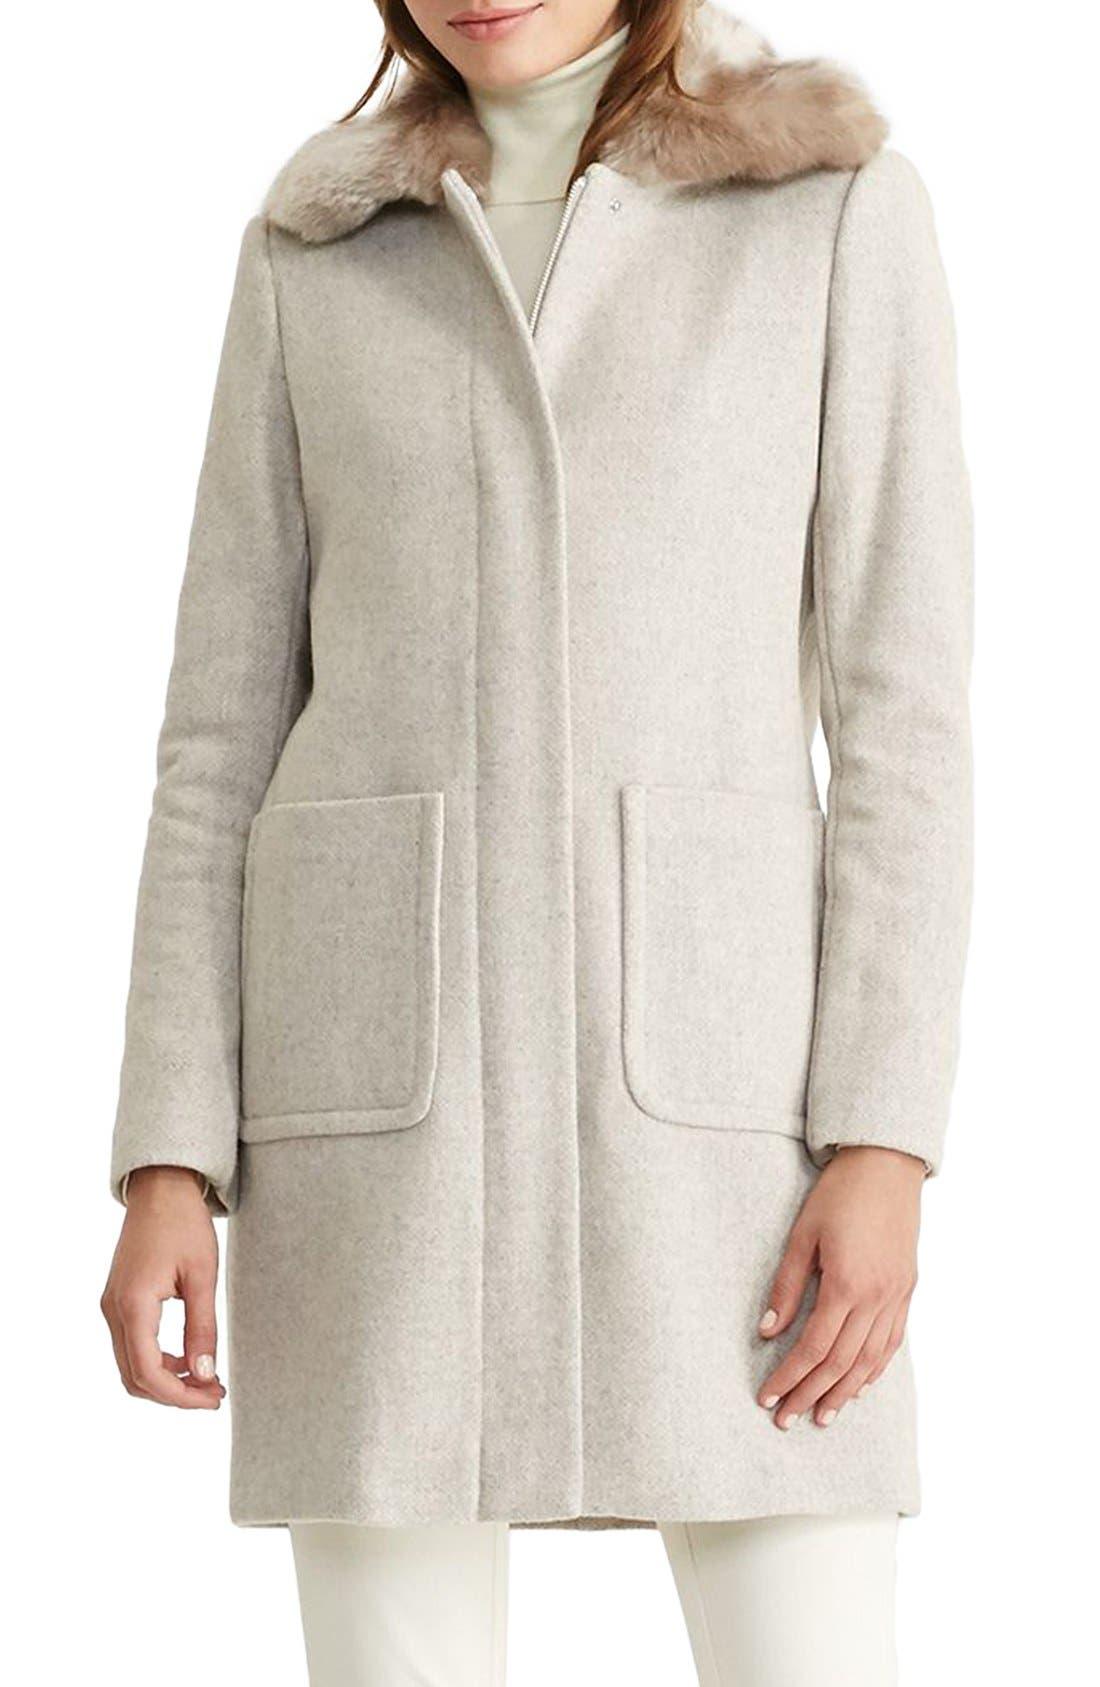 LAUREN RALPH LAUREN,                             Wool Blend Coat with Faux Fur Collar,                             Main thumbnail 1, color,                             068